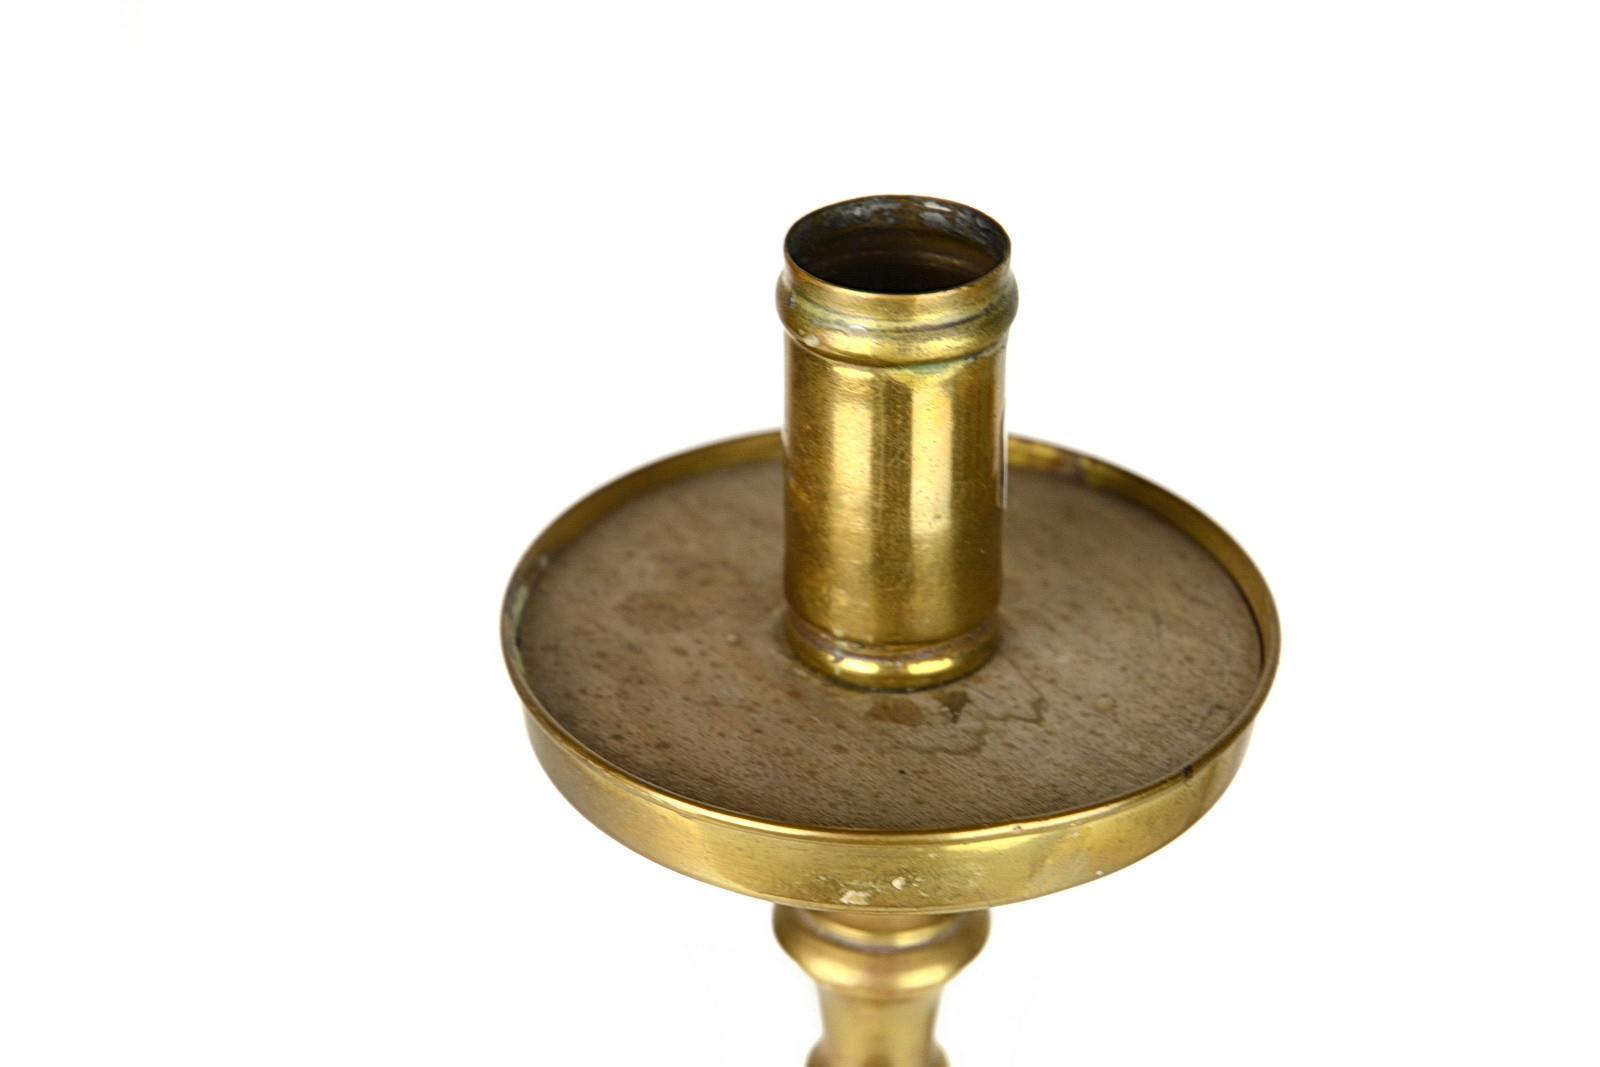 antichi-candelabri-in-ottone-dorato-3,2980.jpg?WebbinsCacheCounter=1